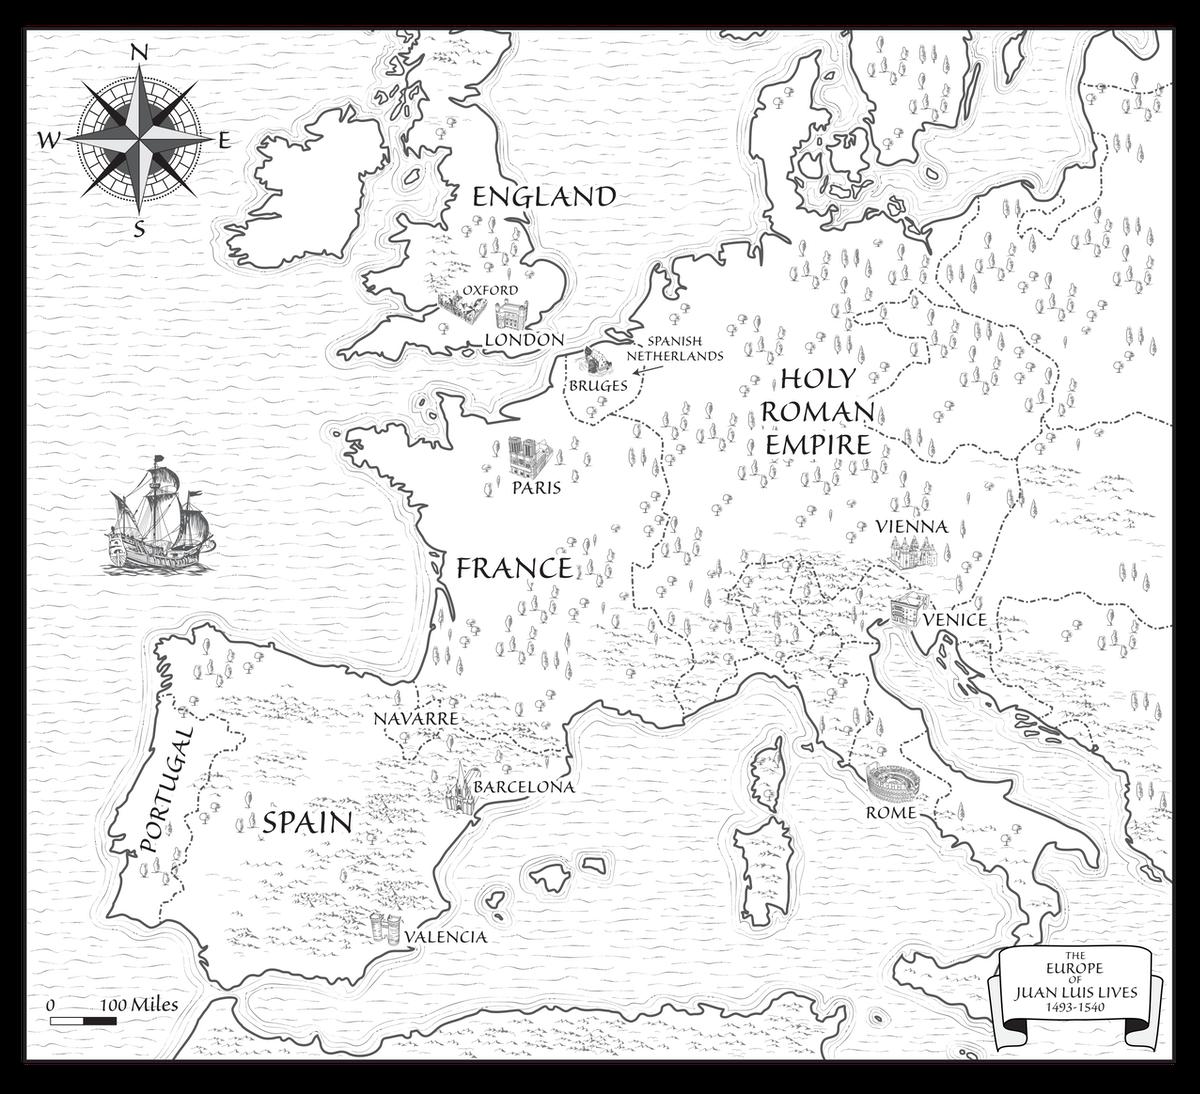 Custom made map designs - Standard/Basic